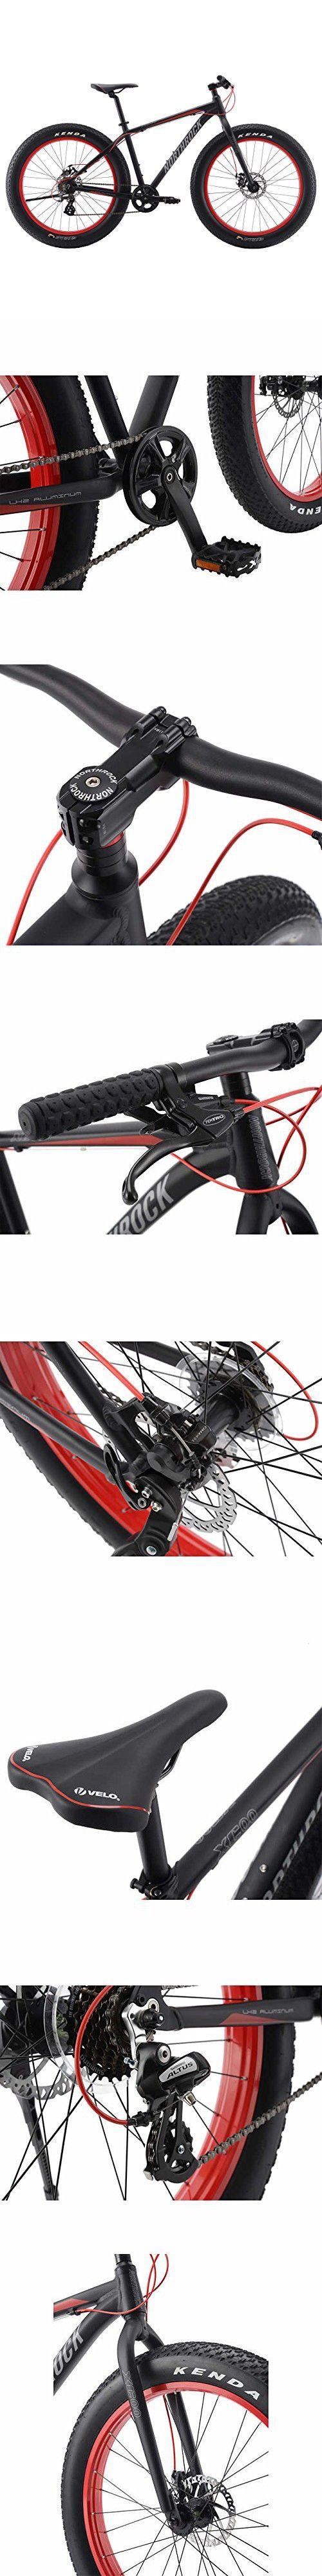 Northrock Xcoo Fat Tire Mountain Bike Mountain Bikes Pinterest